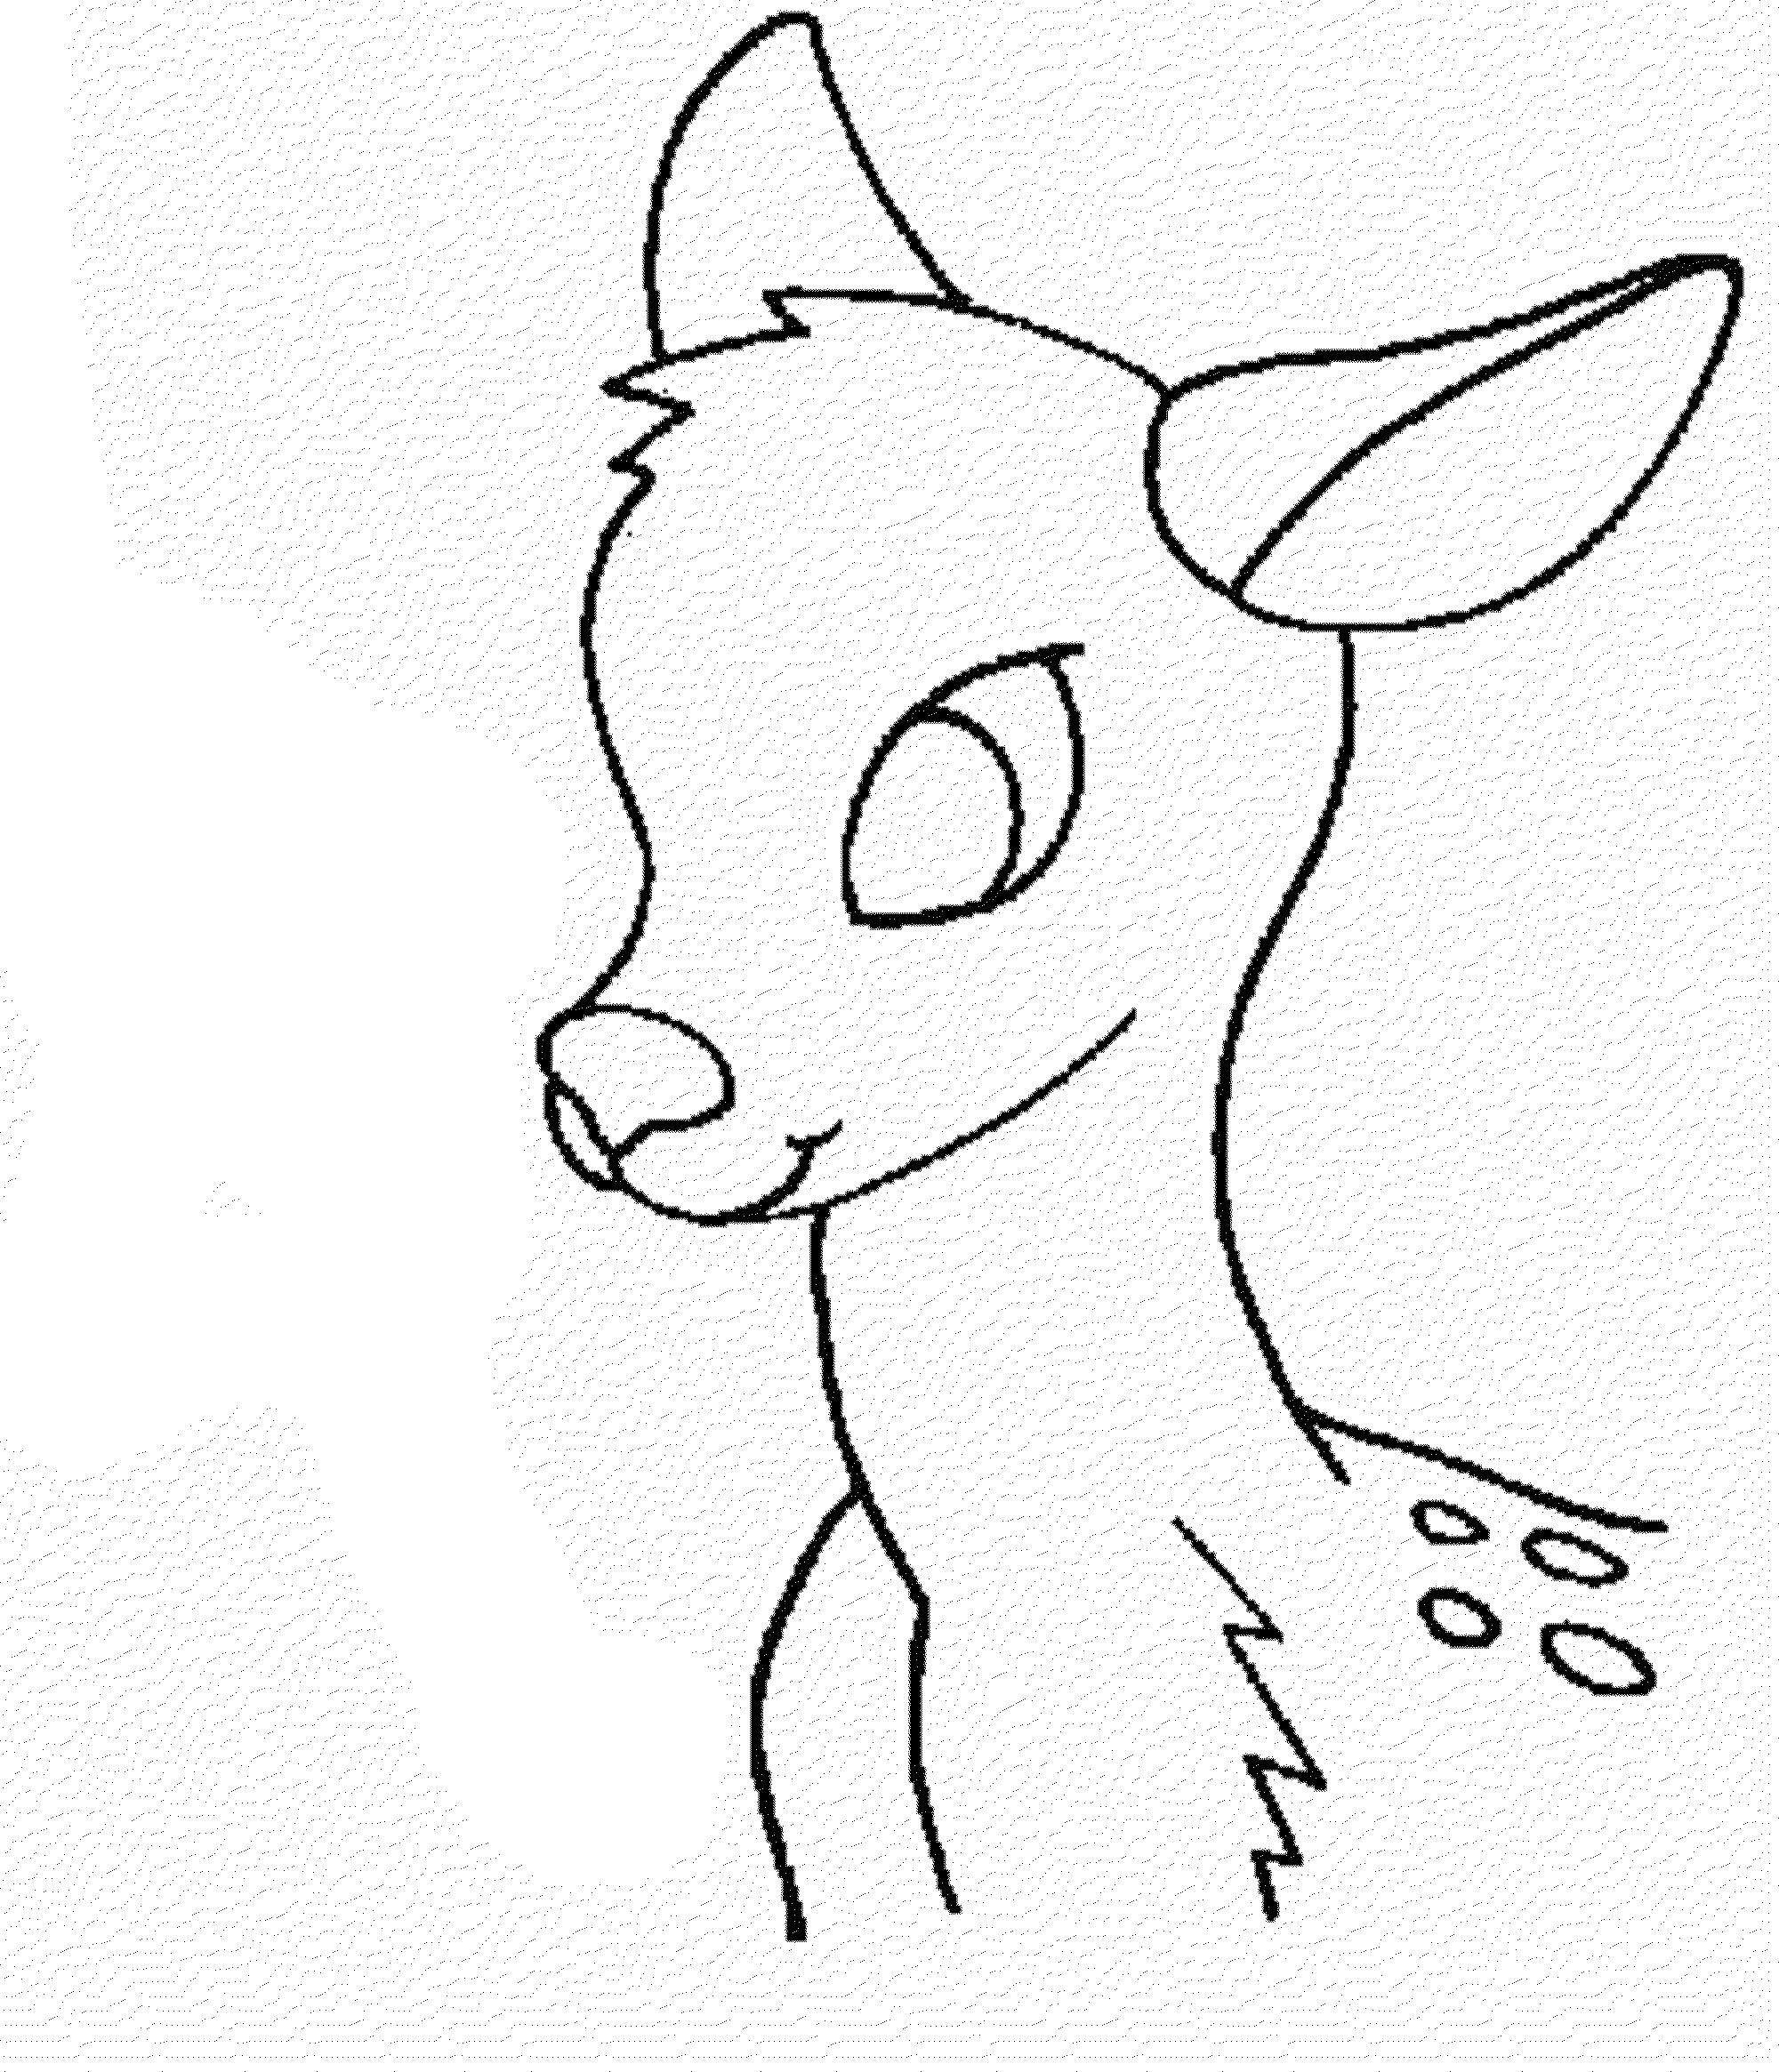 animal head coloring pages deer head coloring pages coloring pages to download and pages animal coloring head